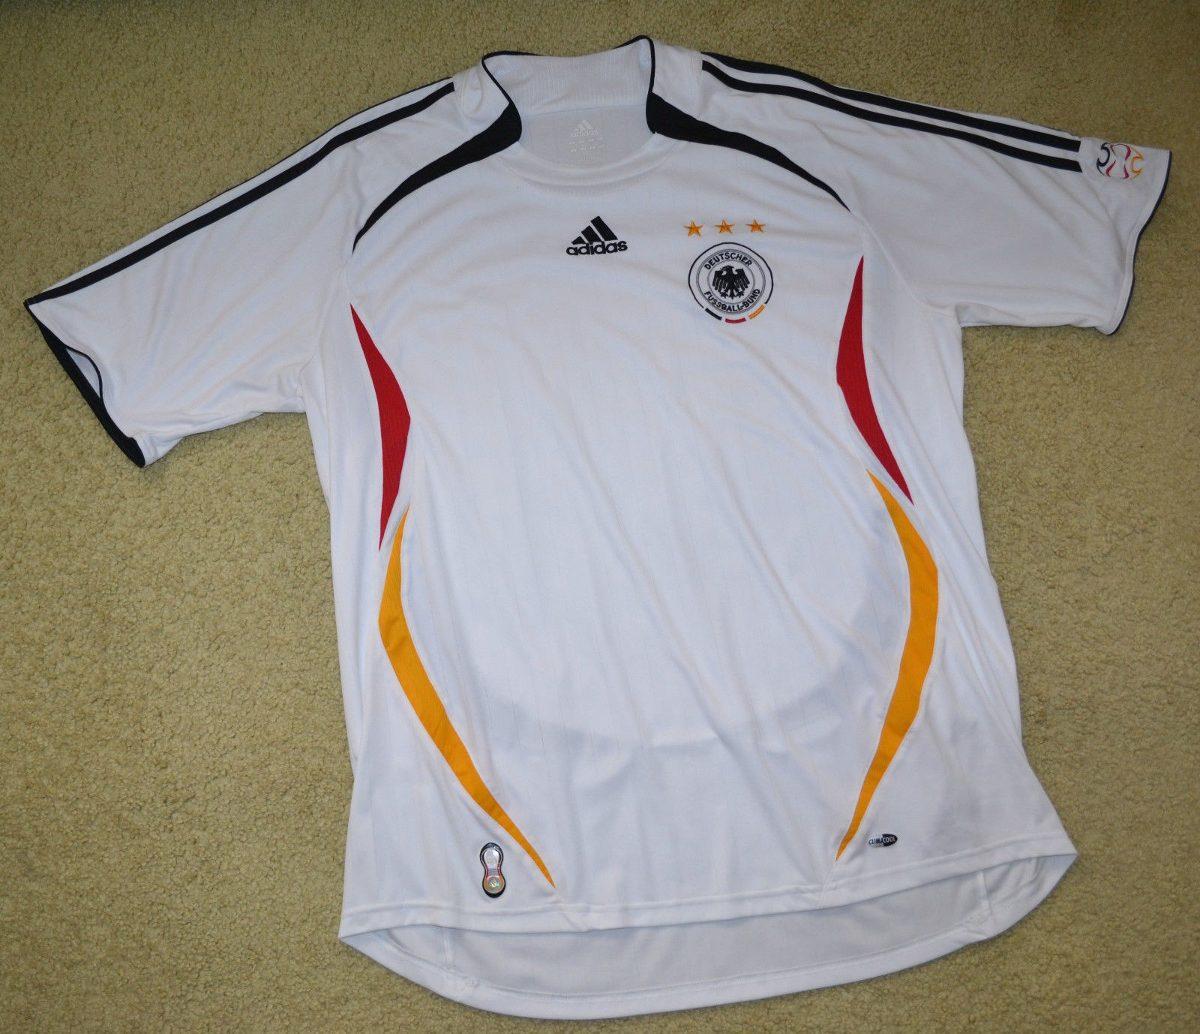 camisa alemanha copa 2006 adidas estado de nova. Carregando zoom. 03c9e01648eee